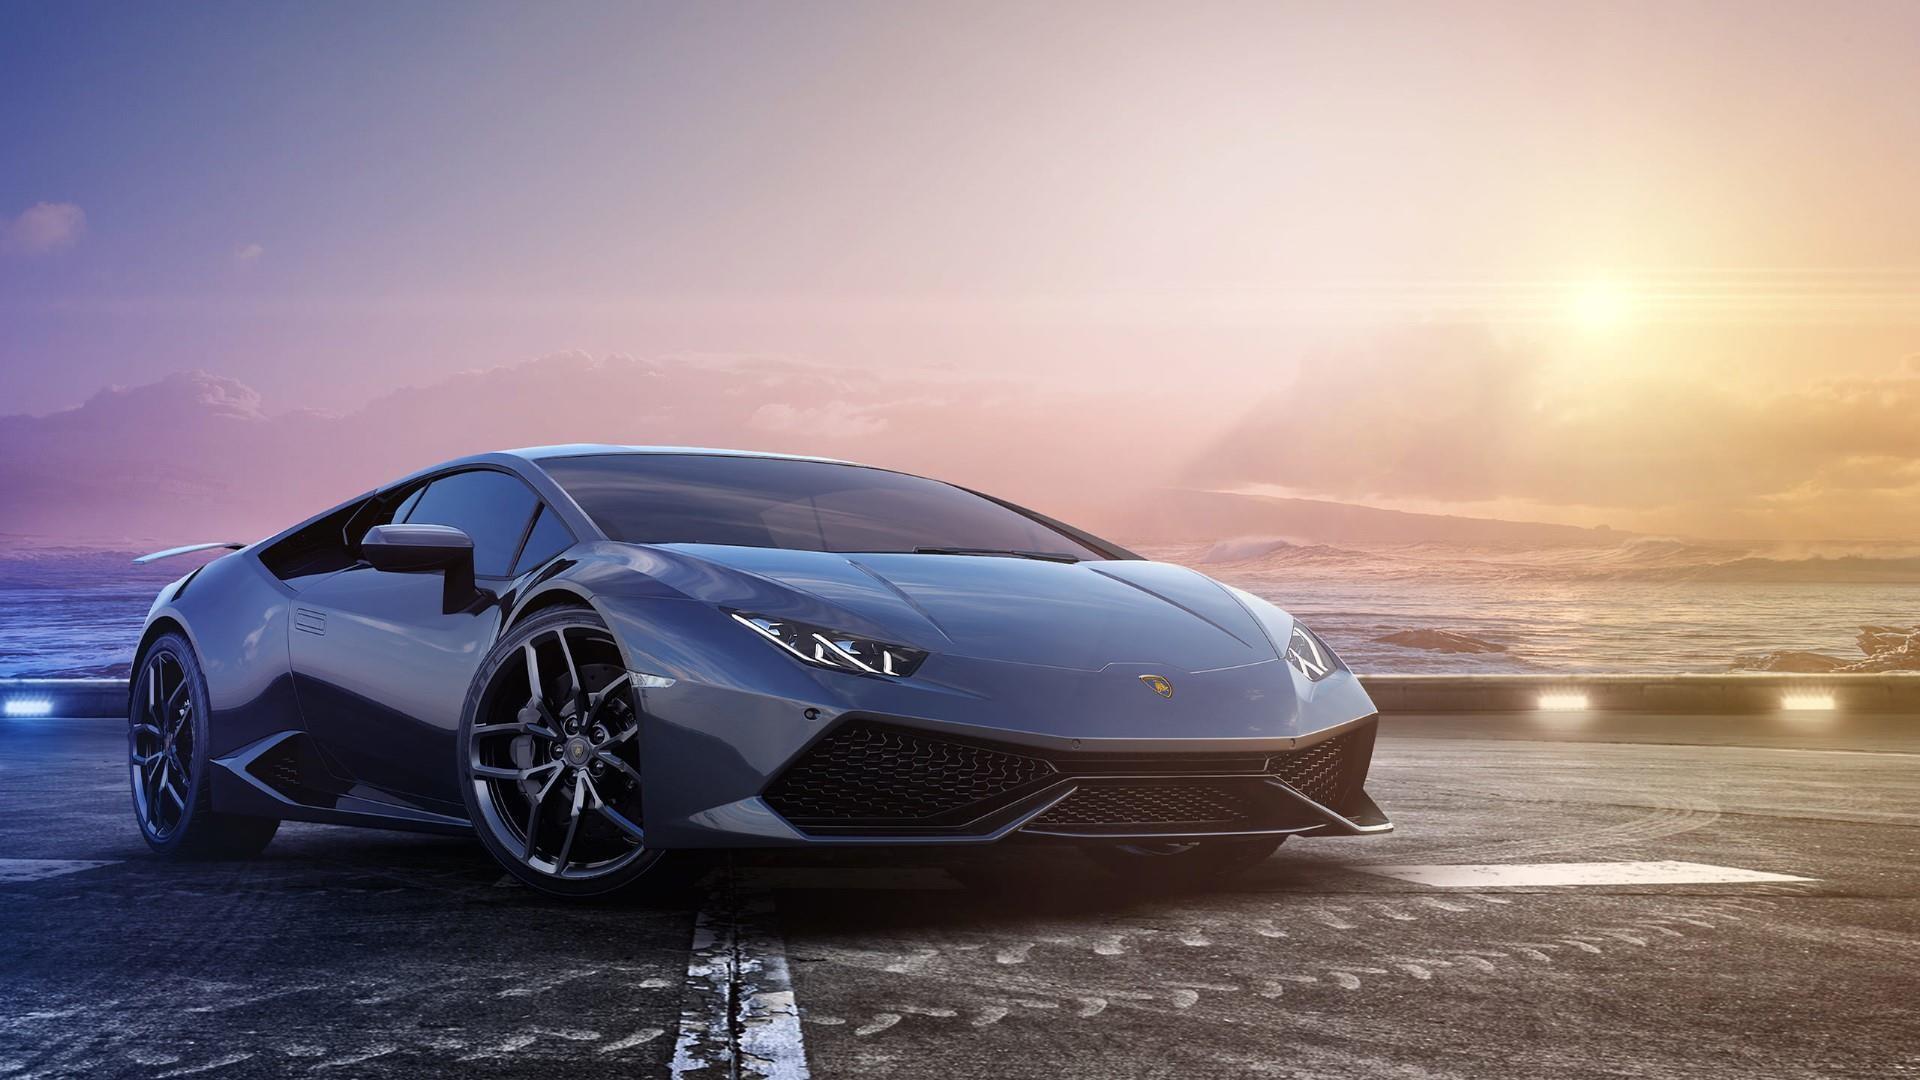 Lamborghini ламборгини тоннель  № 315901 бесплатно